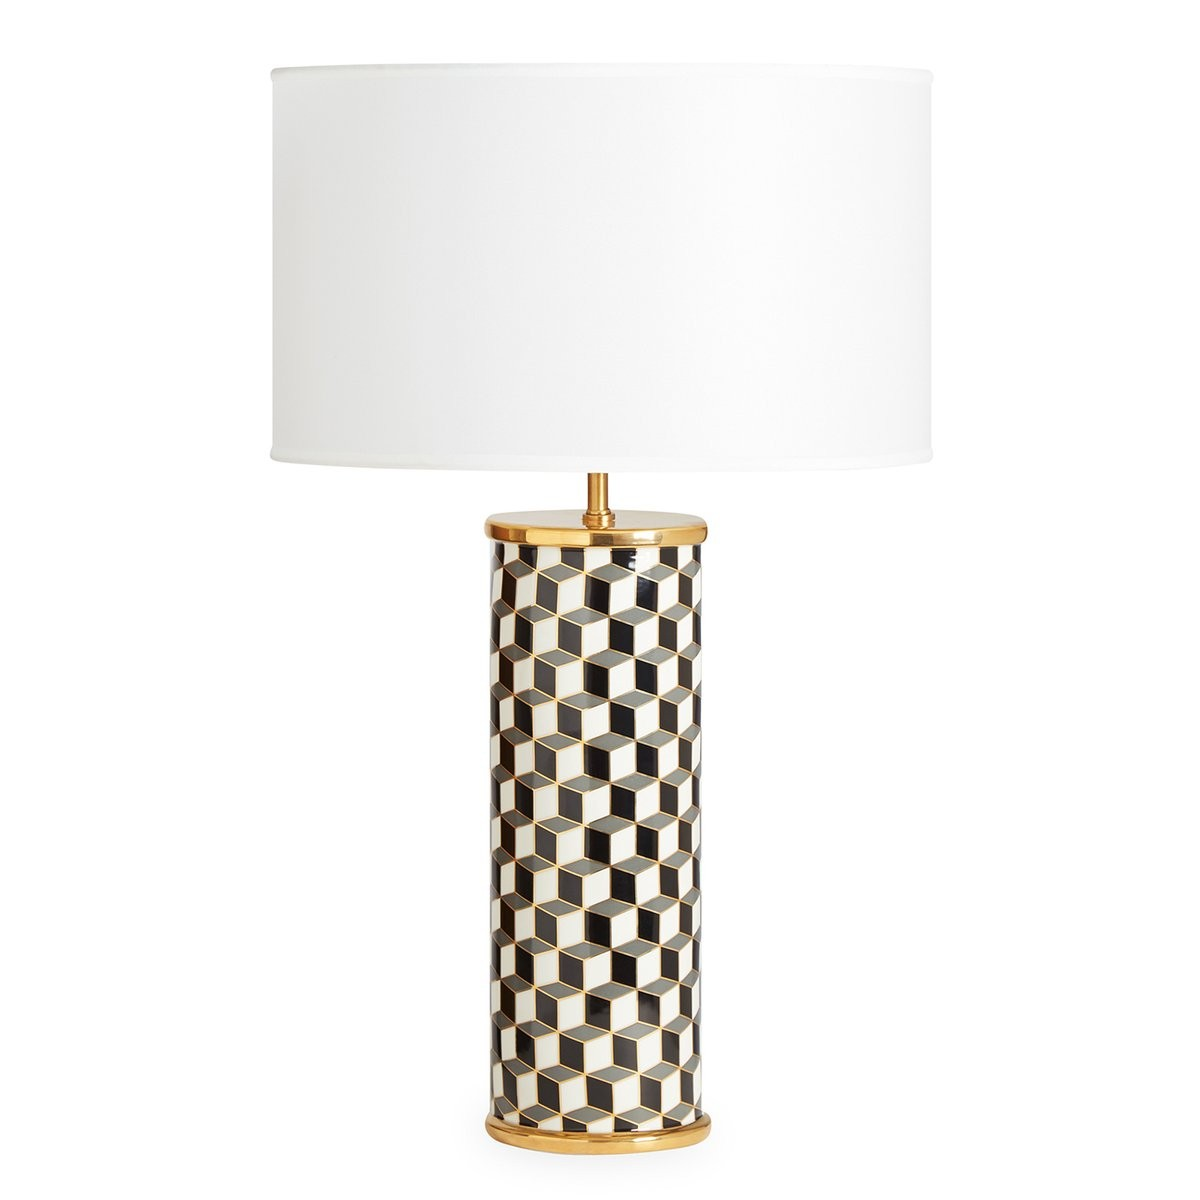 Jonathan Adler I Carnaby Table Lamp I Black & Grey